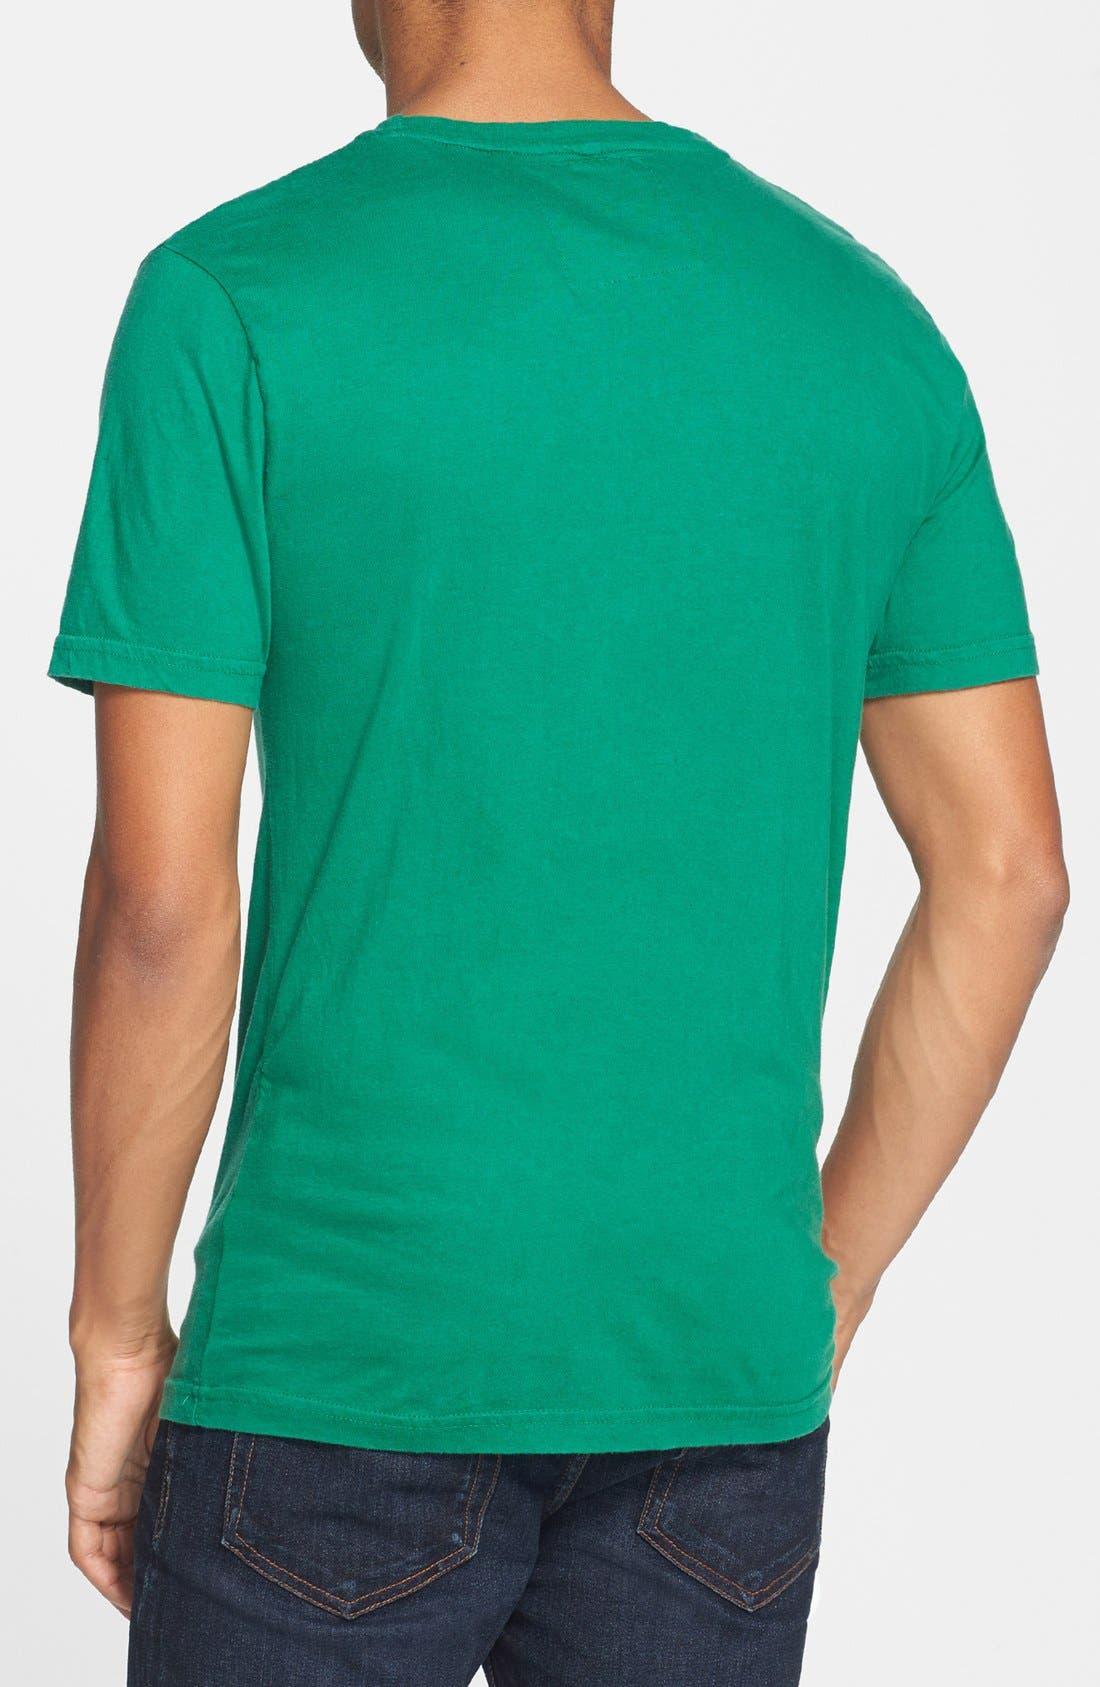 Alternate Image 2  - Red Jacket 'Brass Tacks - Guinness' Cotton T-Shirt